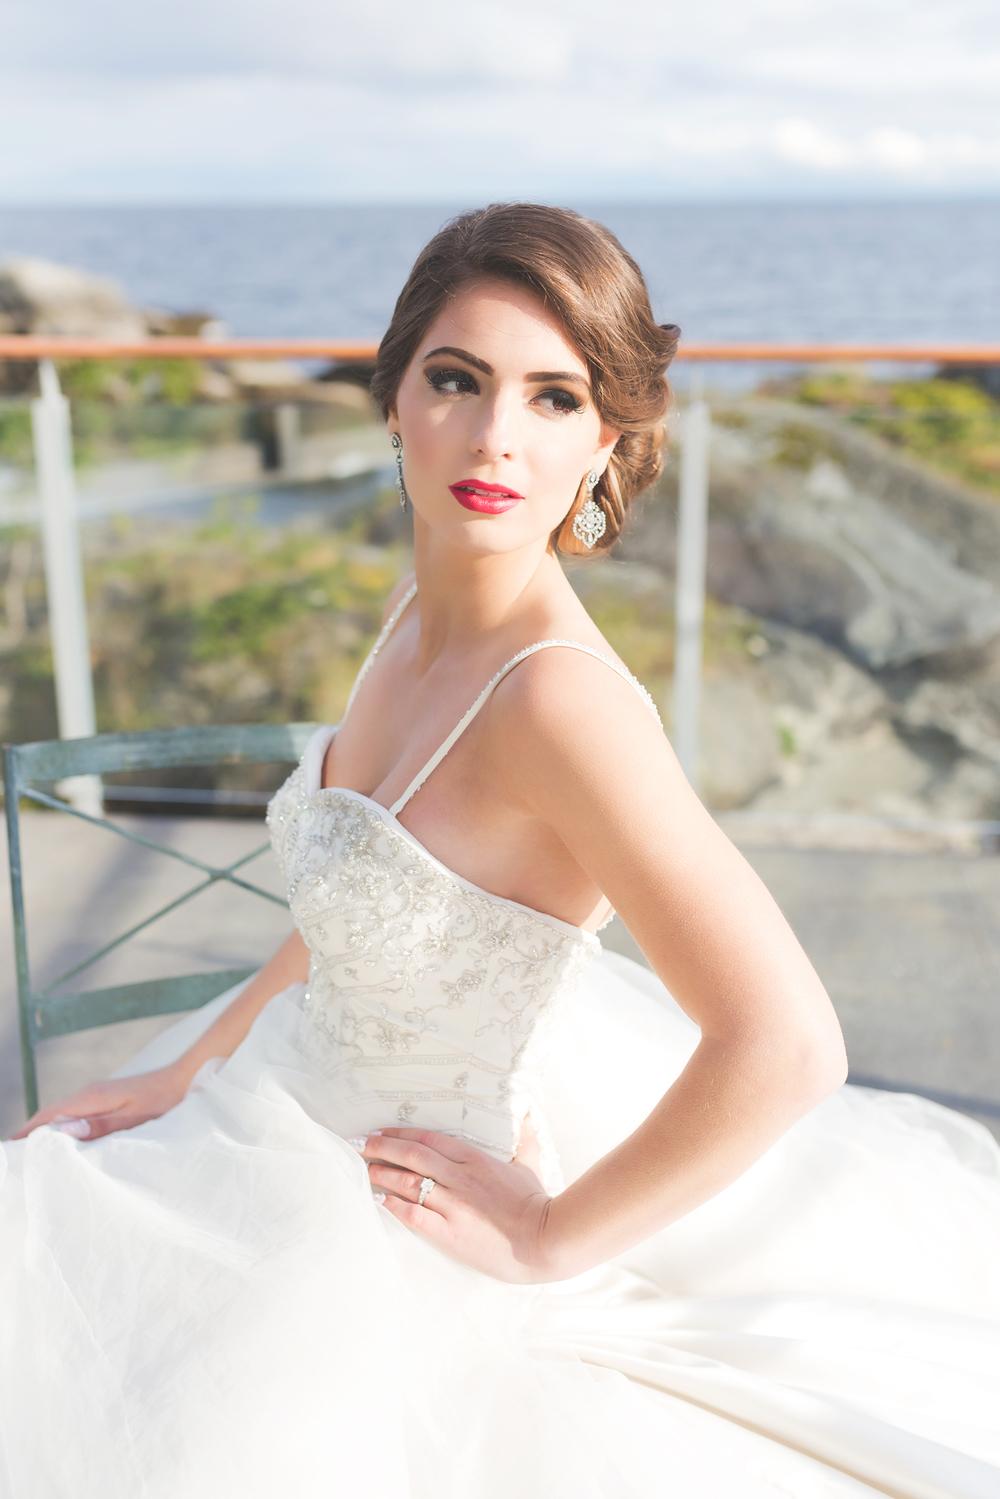 IMG_6867-BRIDAL-EDITORIAL-JENNIFER-PICARD-PHOTOGRAPHY-FINE-ART-WEDDINGS.jpg